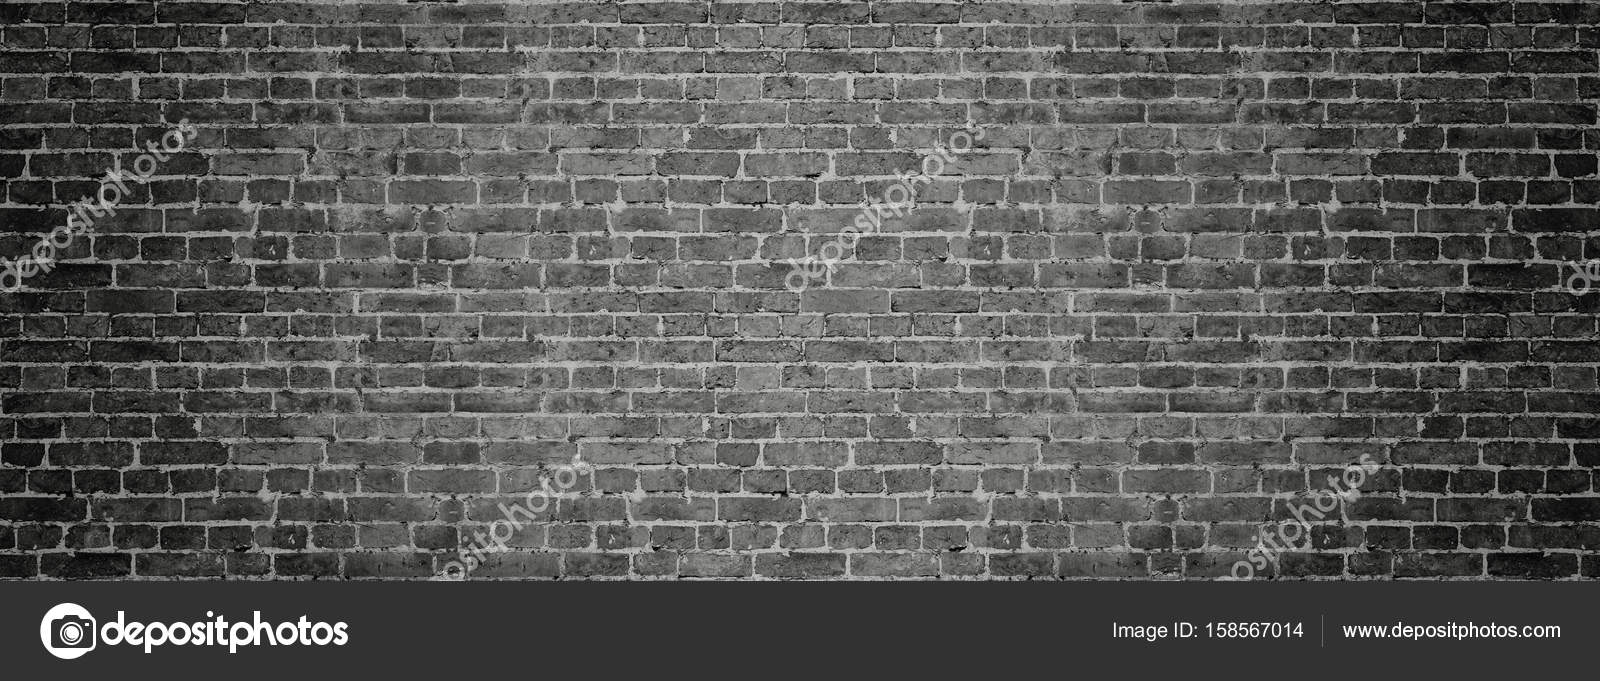 Black brick wall panoramic background stock photo interpas black brick wall panorama for background old brickwork vintage wallpaper photo by interpas voltagebd Choice Image